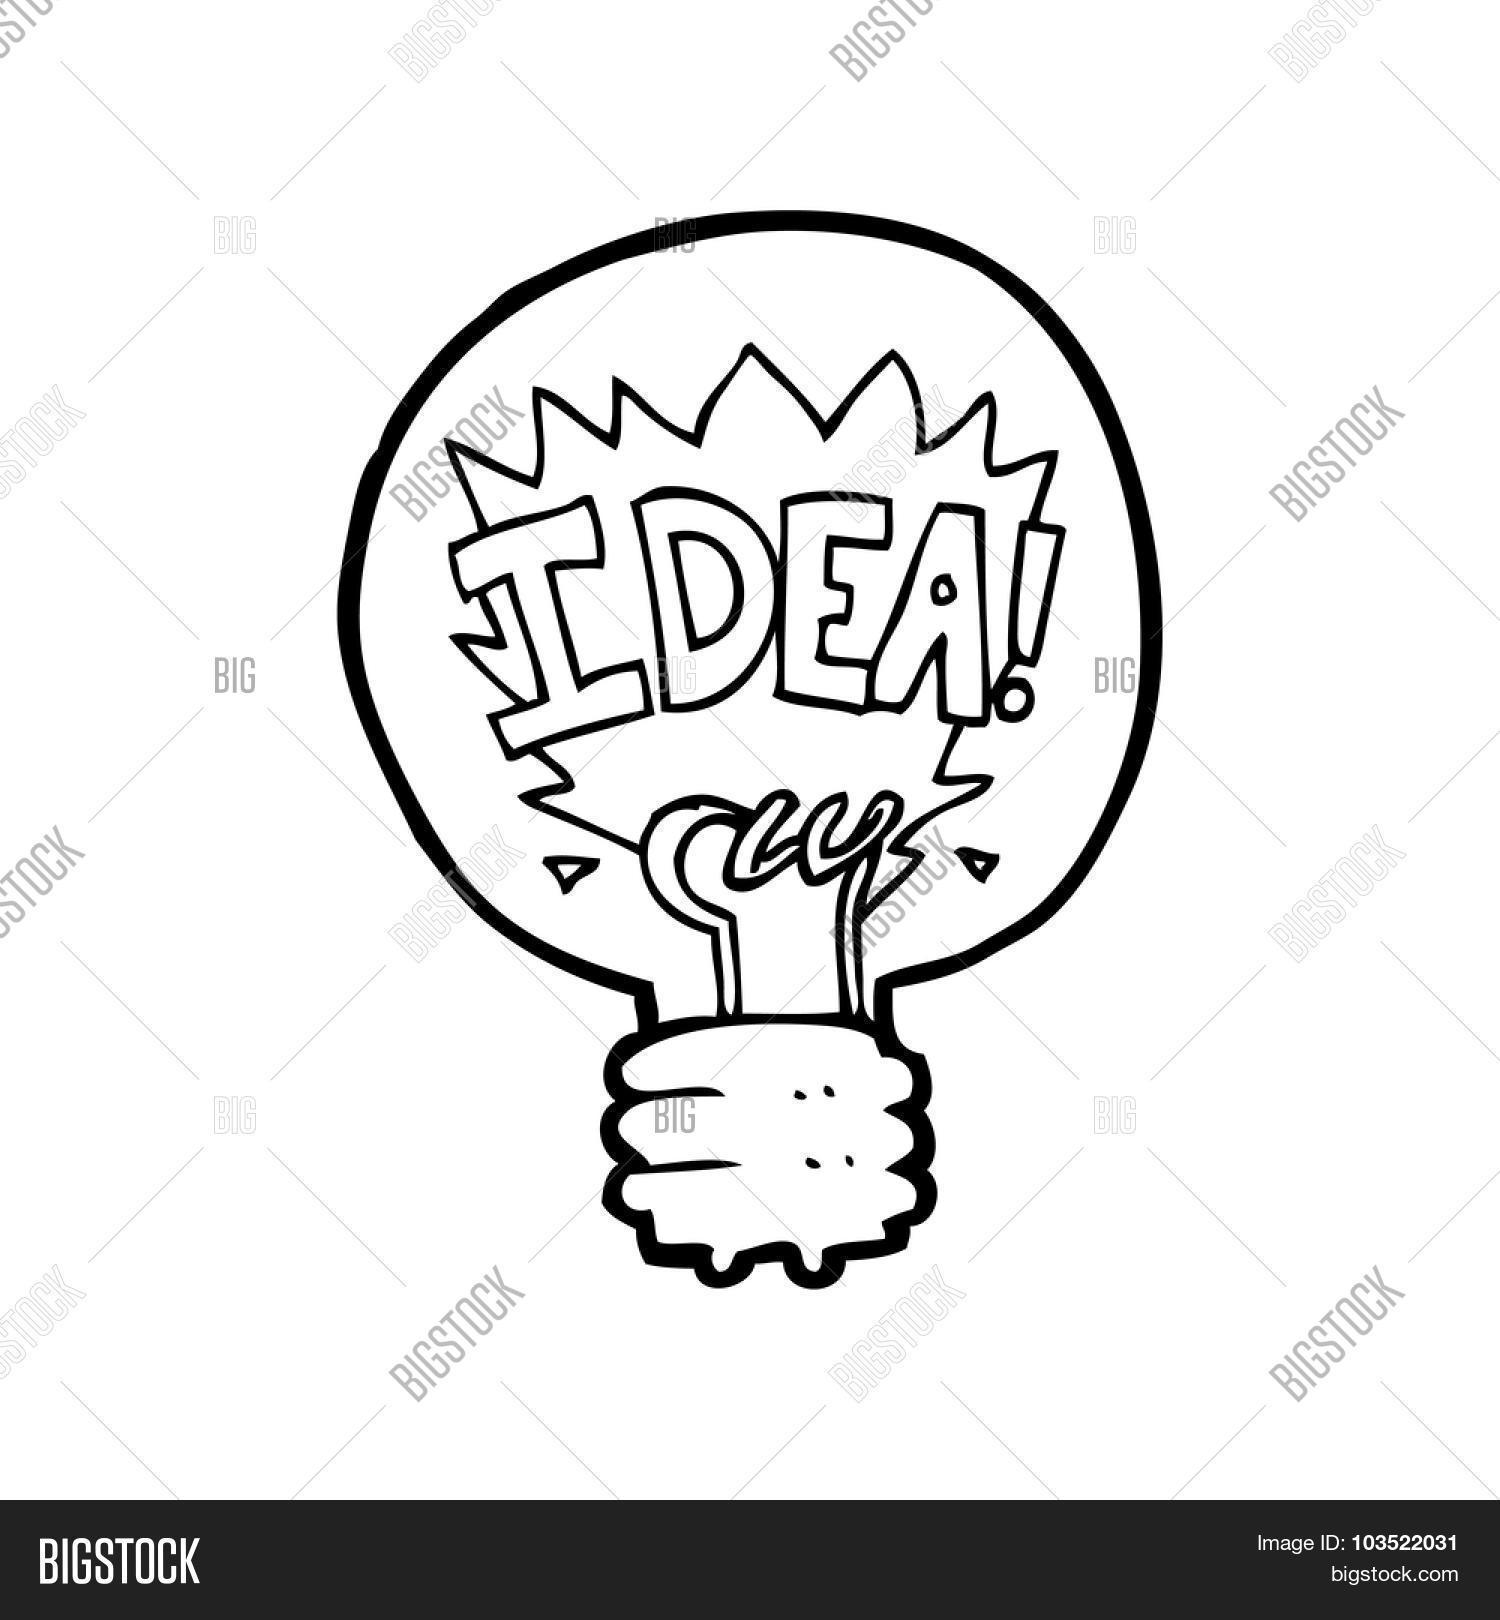 Light Bulb Line Drawing At Getdrawings